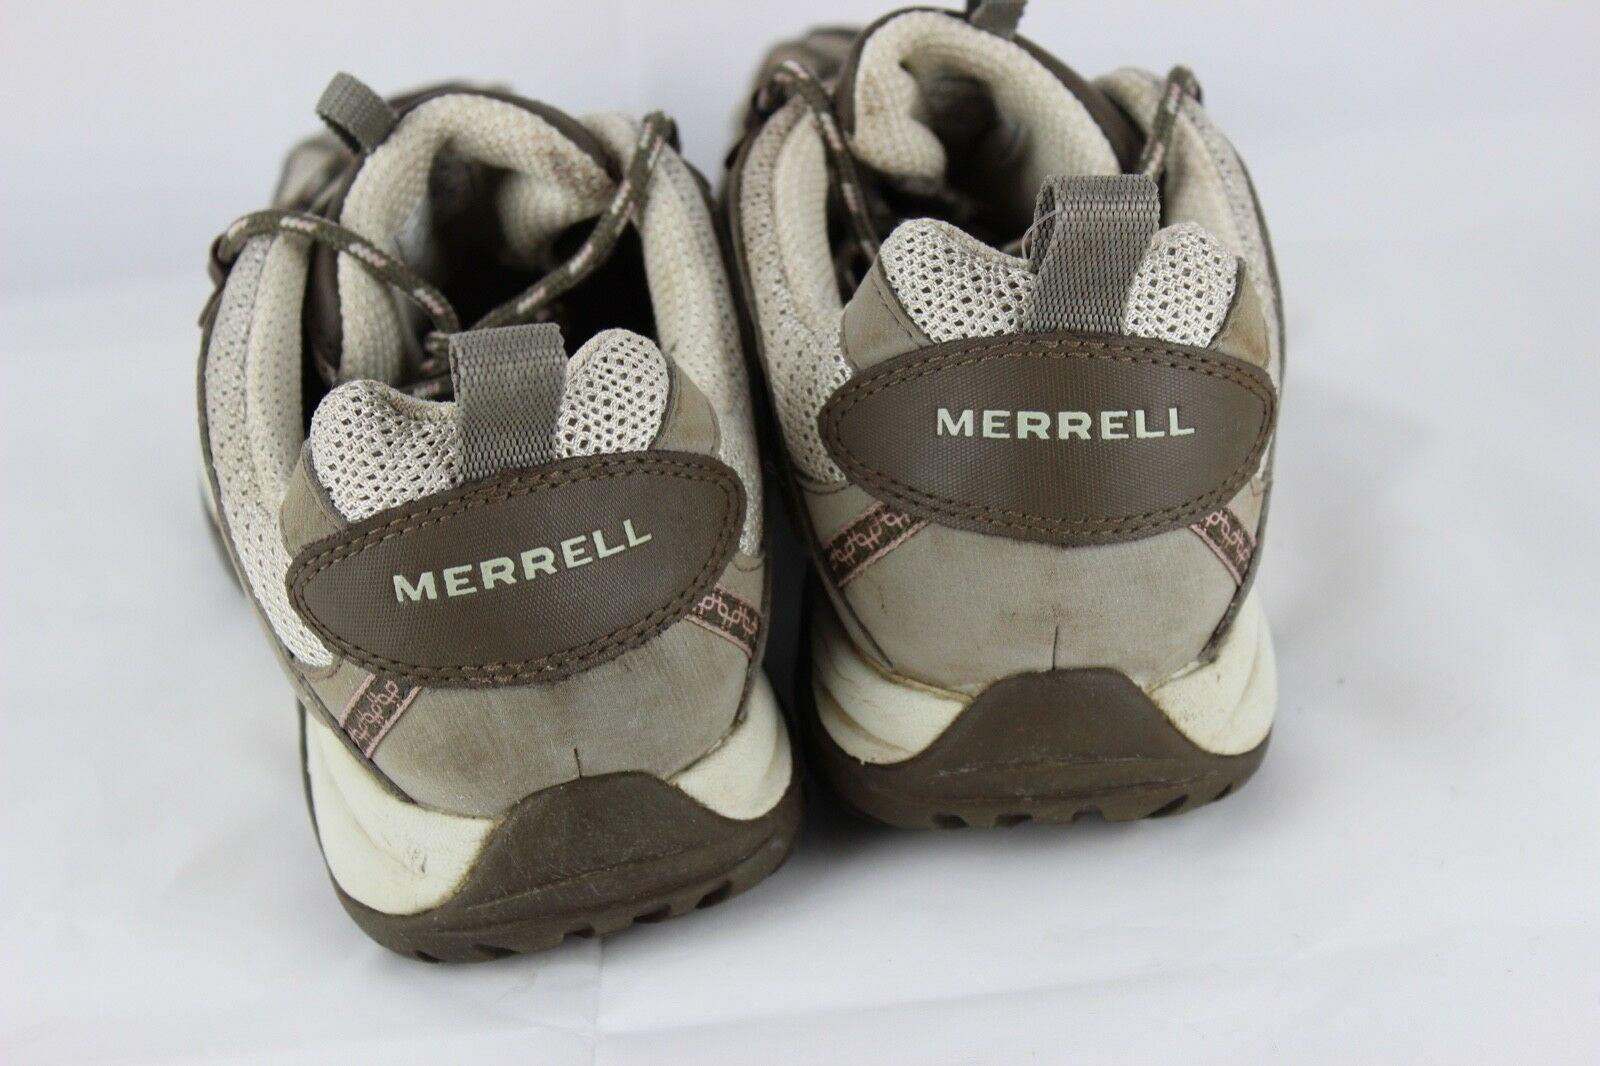 Merrell Elefante Rosa Mujer Performance Calzado Zapatillas Zapatos Size 8.5